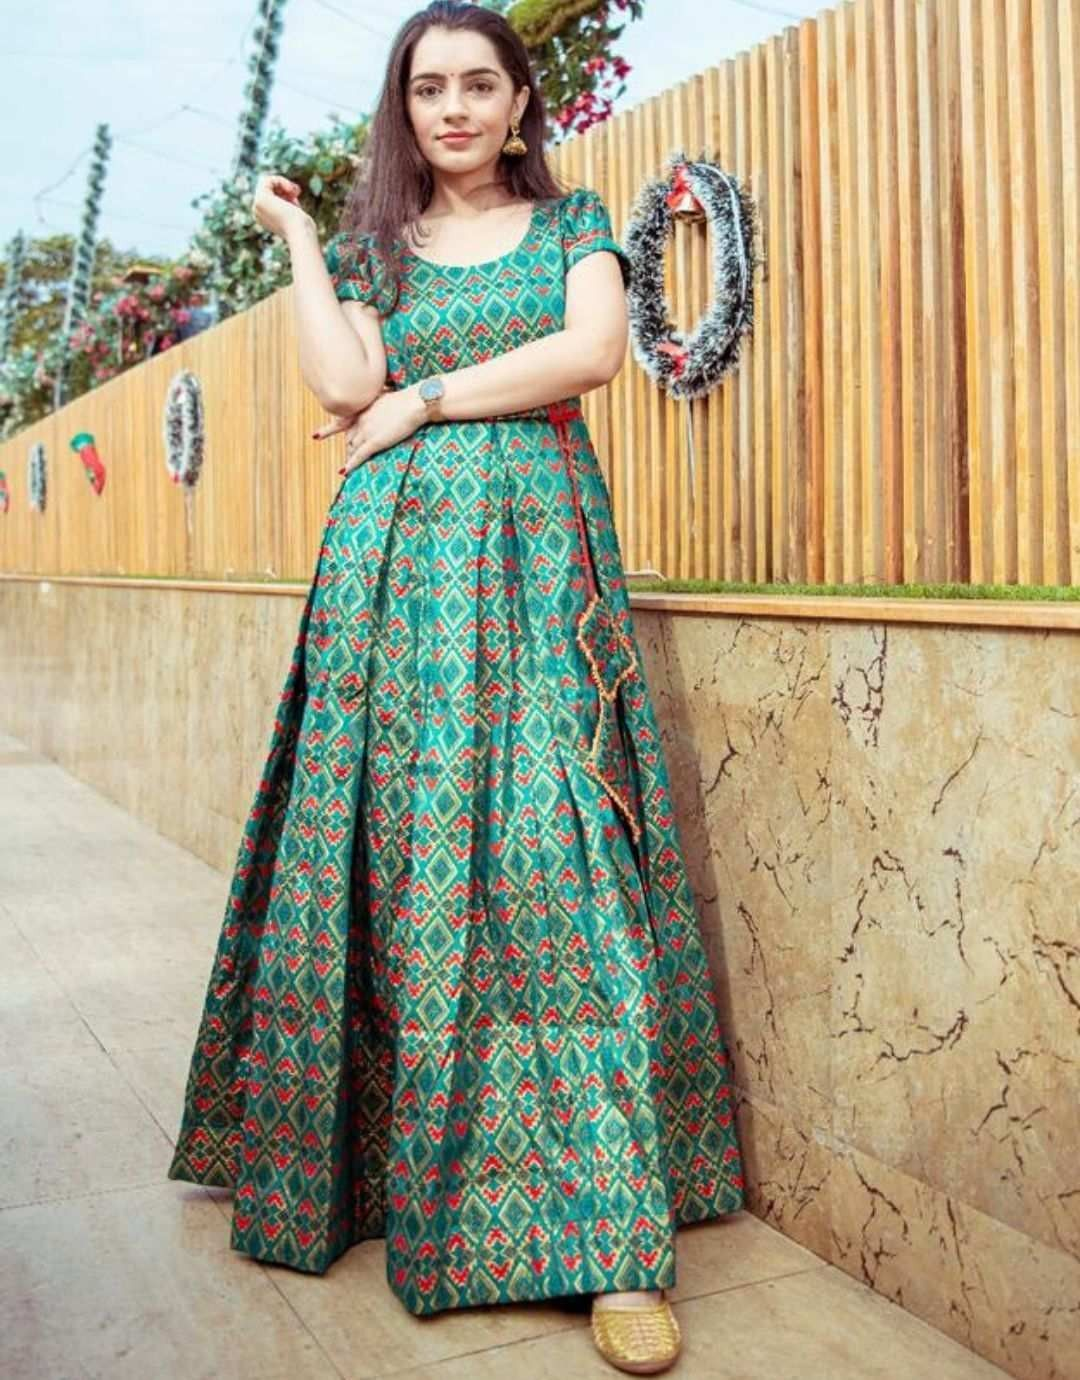 Green Brocade Maxi Dress In 2020 Maxi Dress Designer Dresses Indian Dresses To Wear To A Wedding